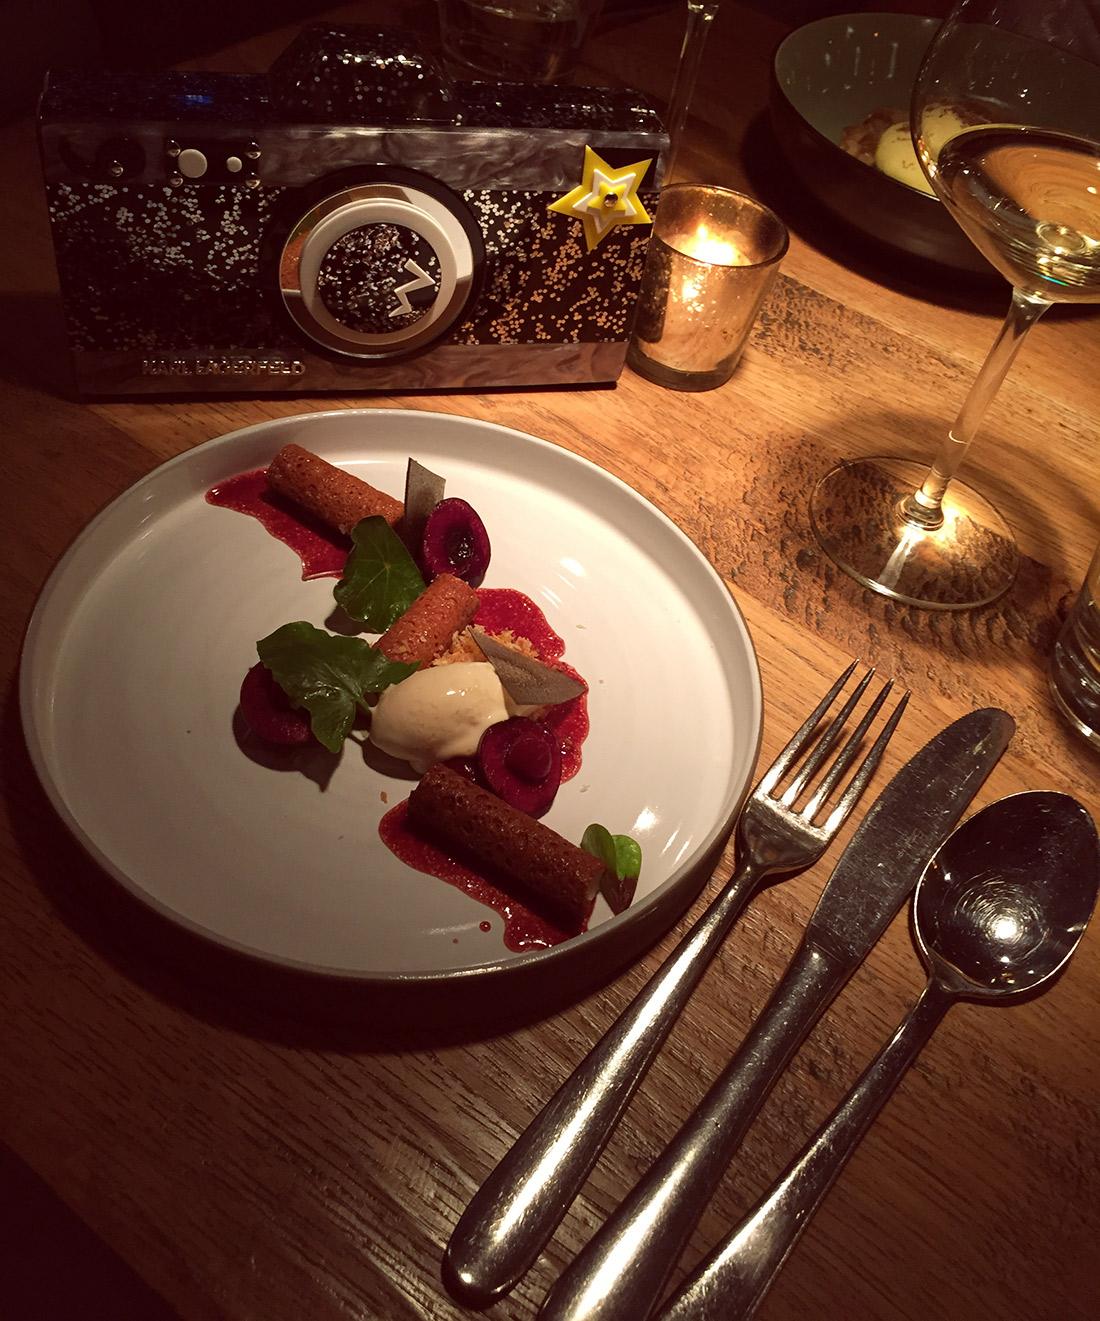 Bag-at-You---Fashion-blog---Restaurant-Sinne-Amsterdam-Dinner